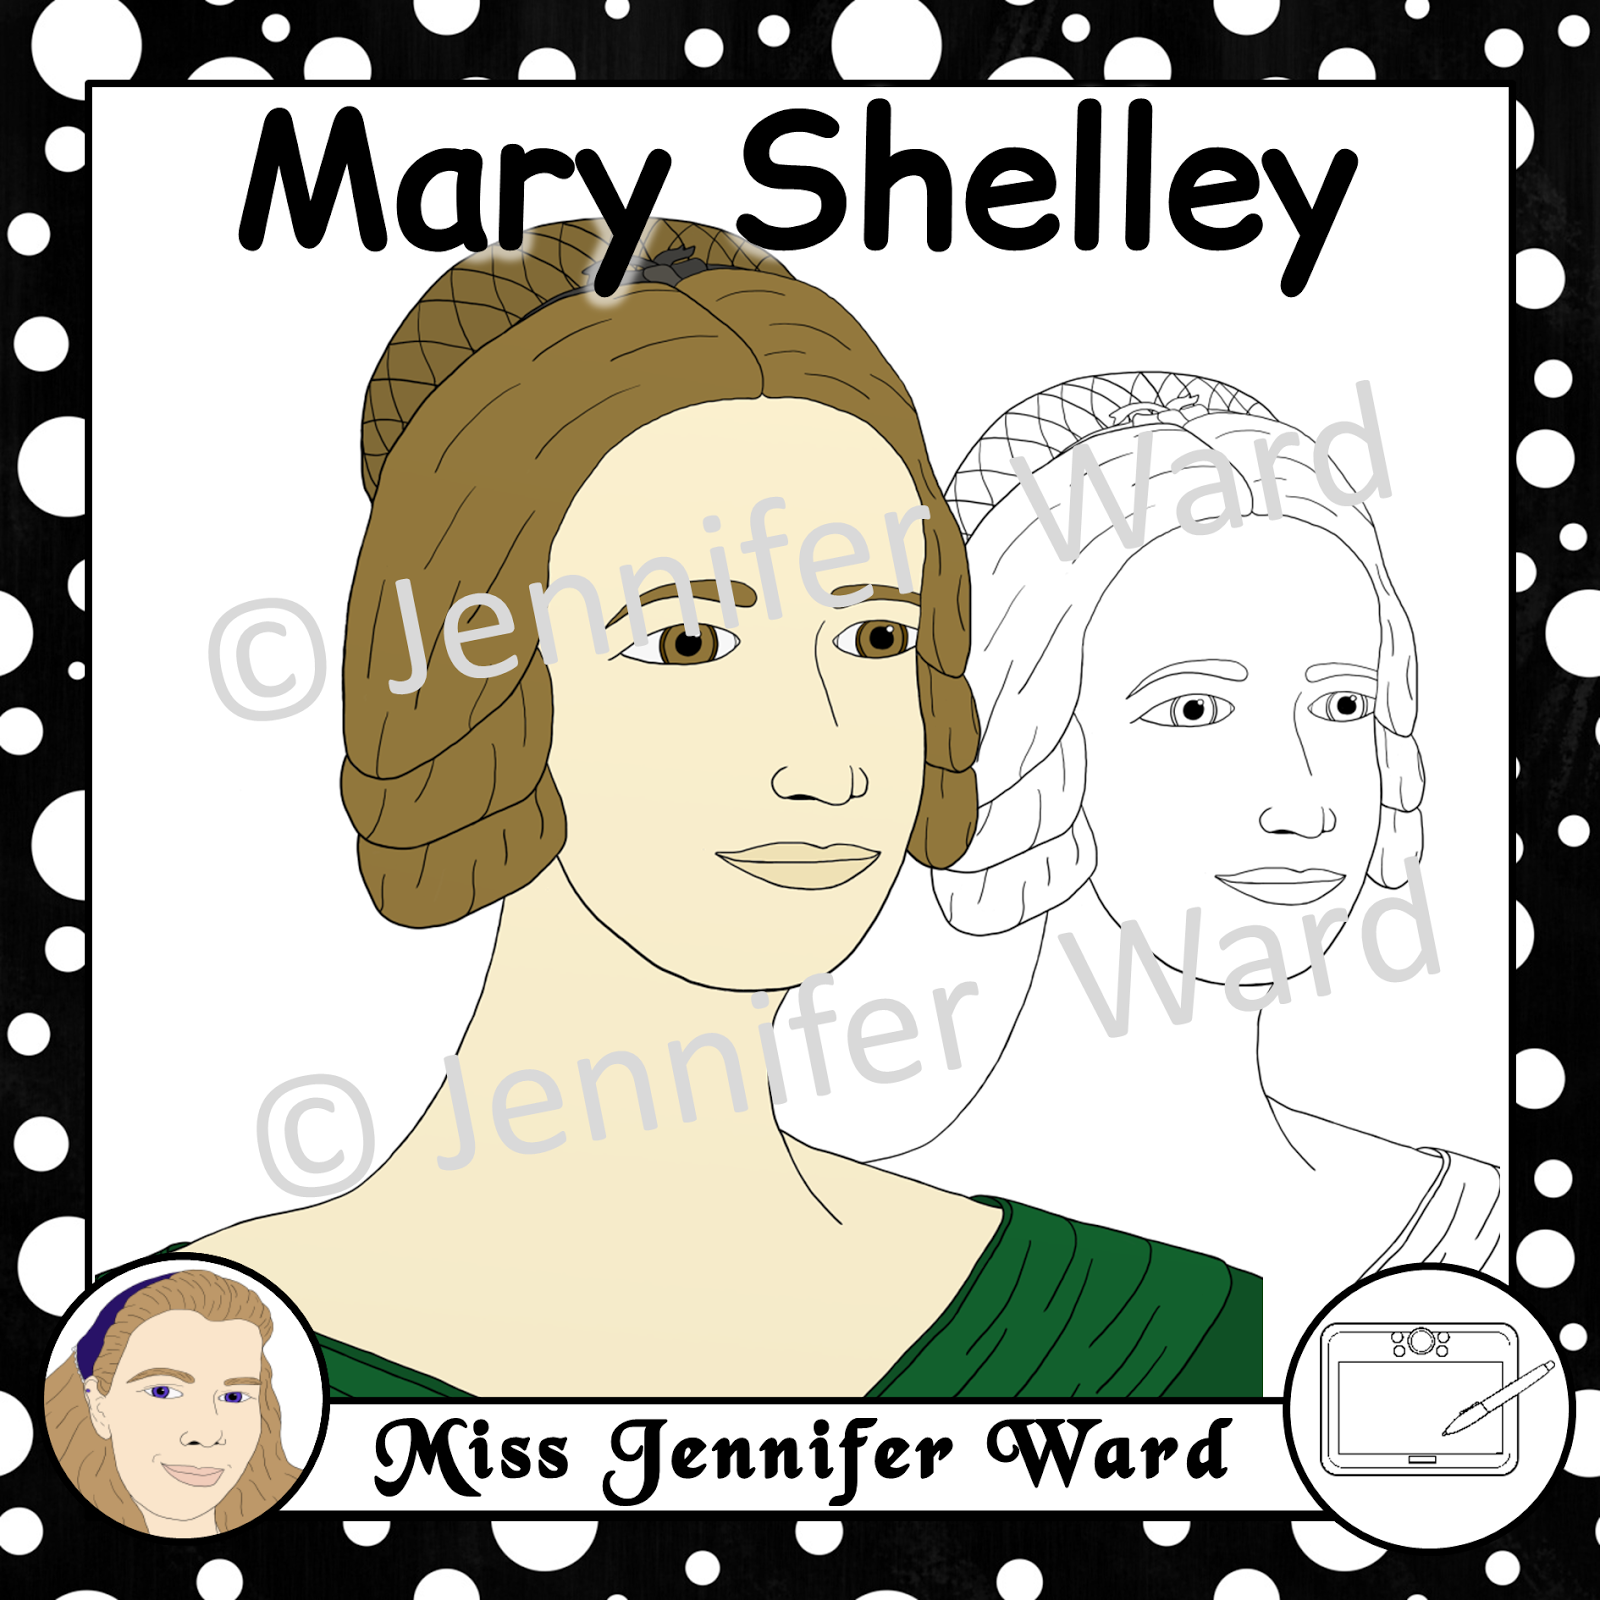 https://www.teacherspayteachers.com/Product/Mary-Shelley-Clipart-2477856